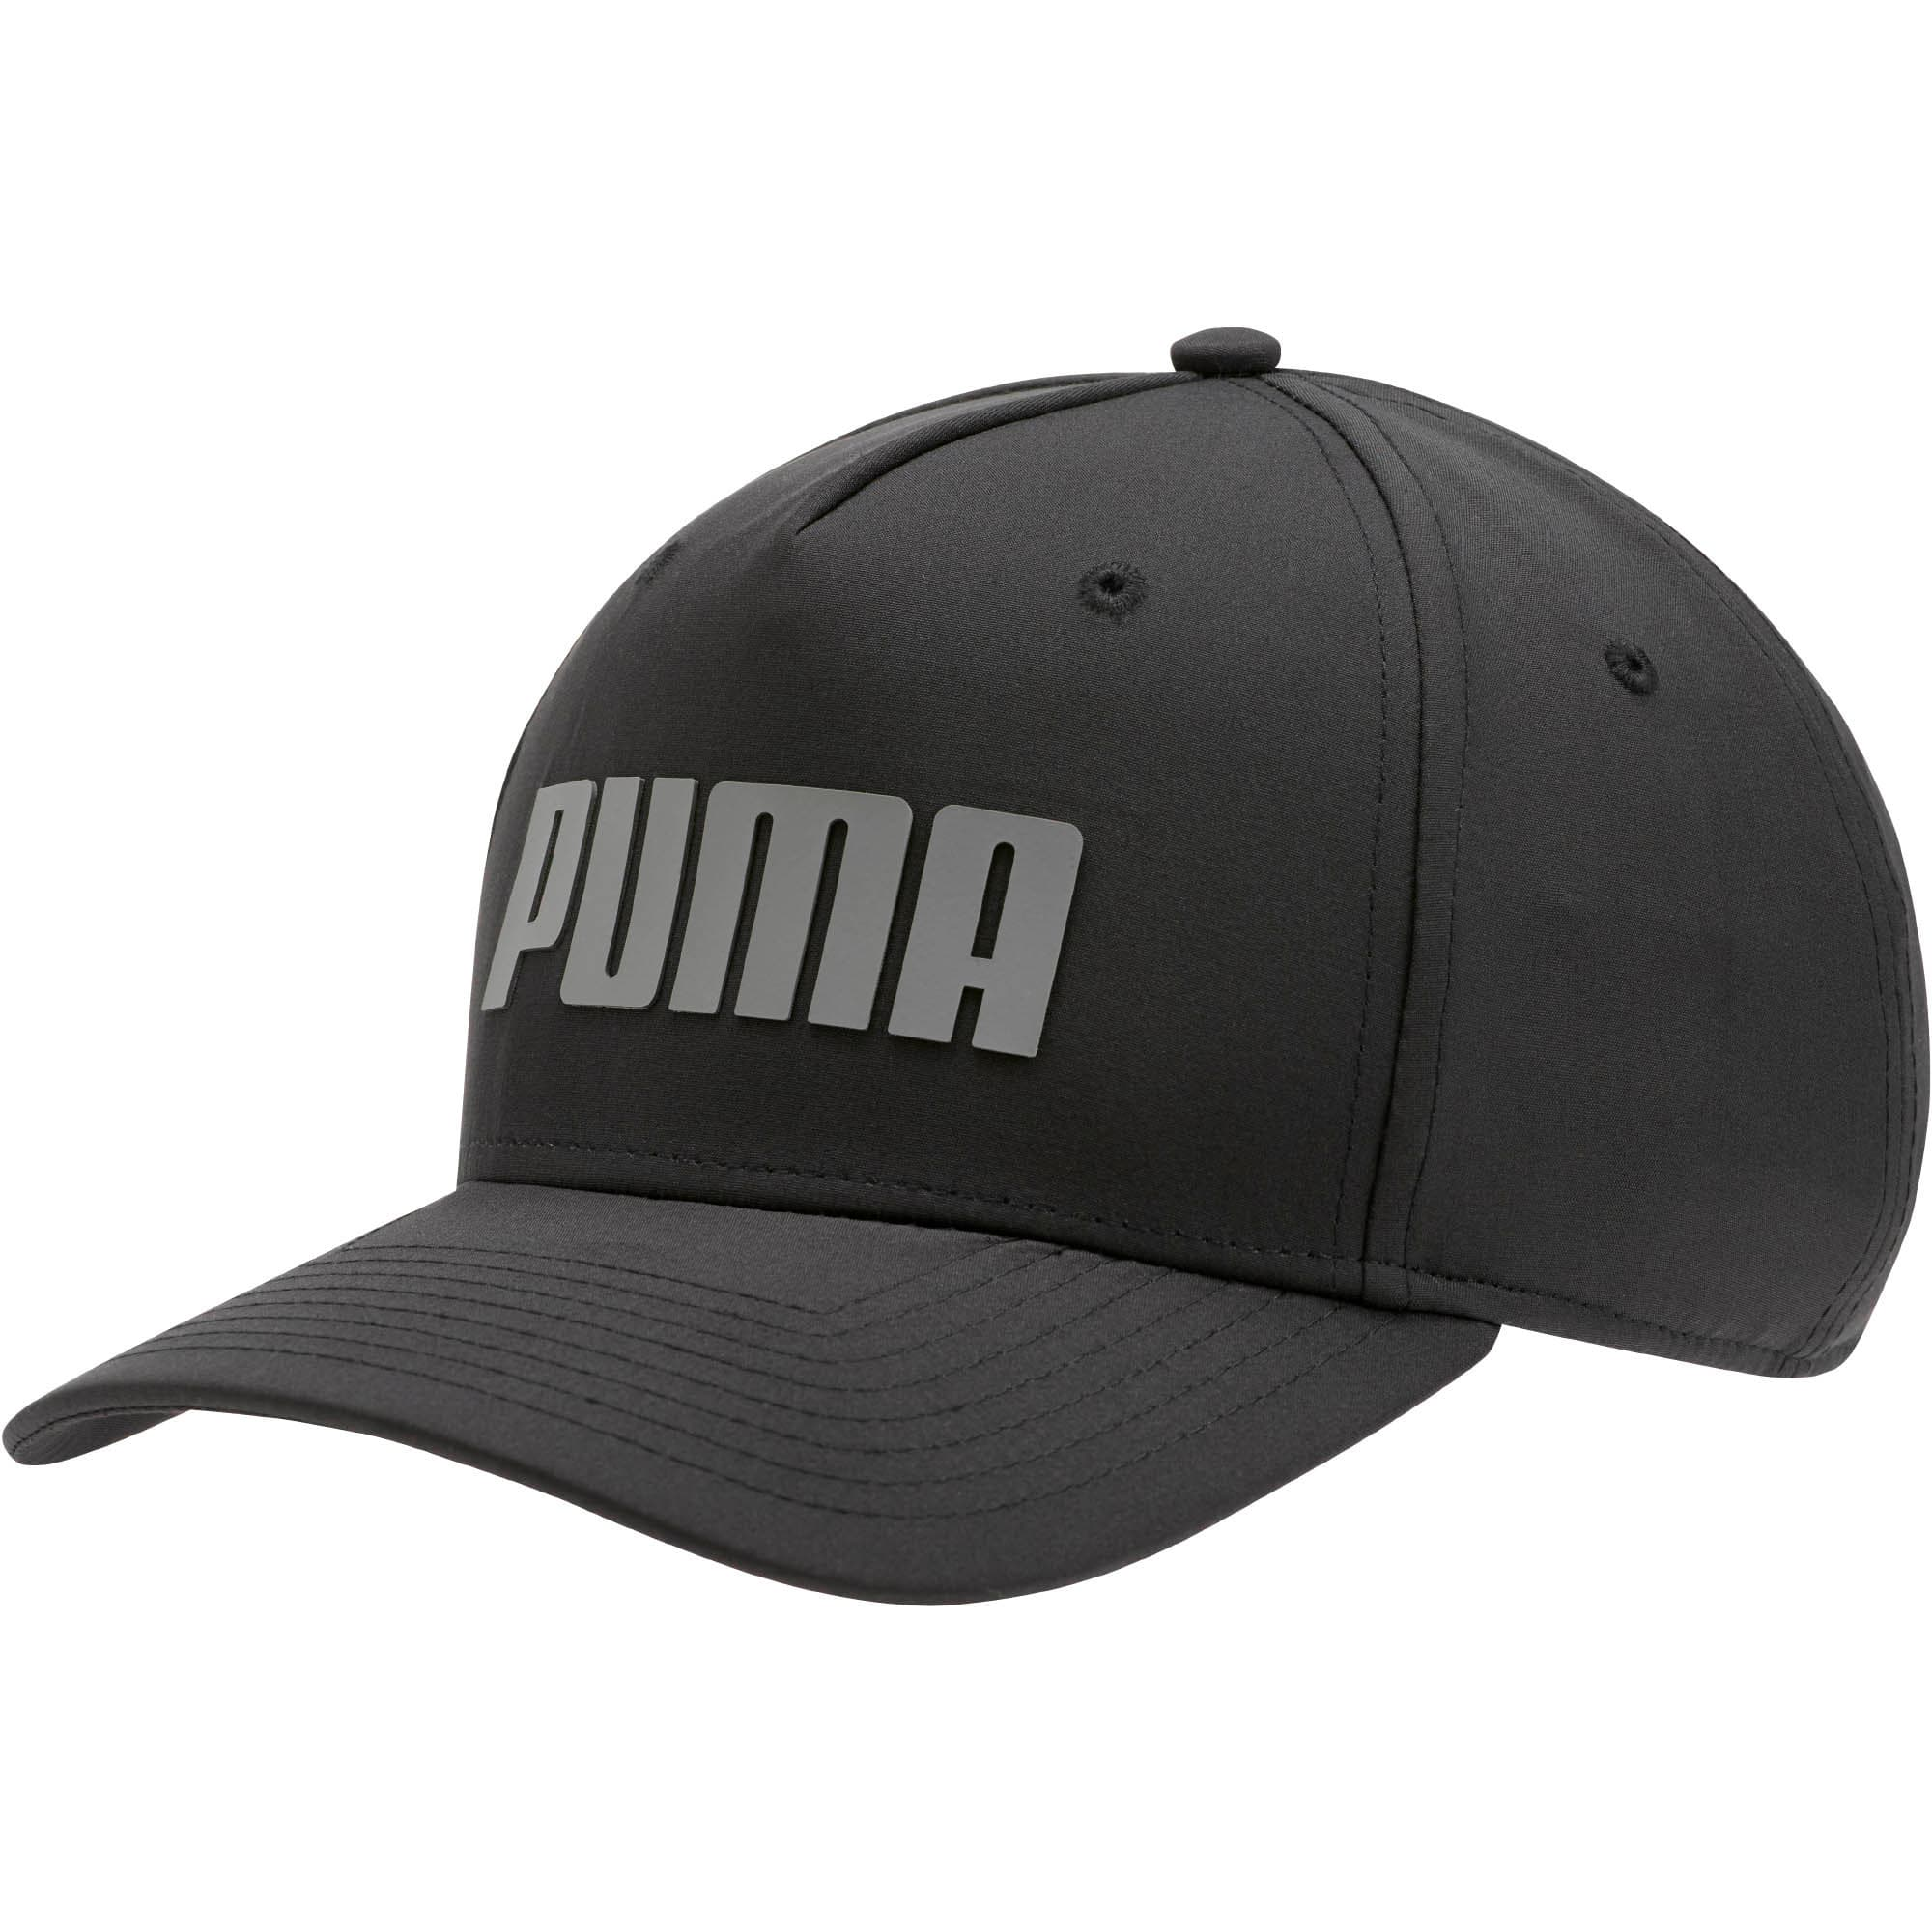 Thumbnail 1 of Go Time Flex Snapback Hat, Puma Black, medium